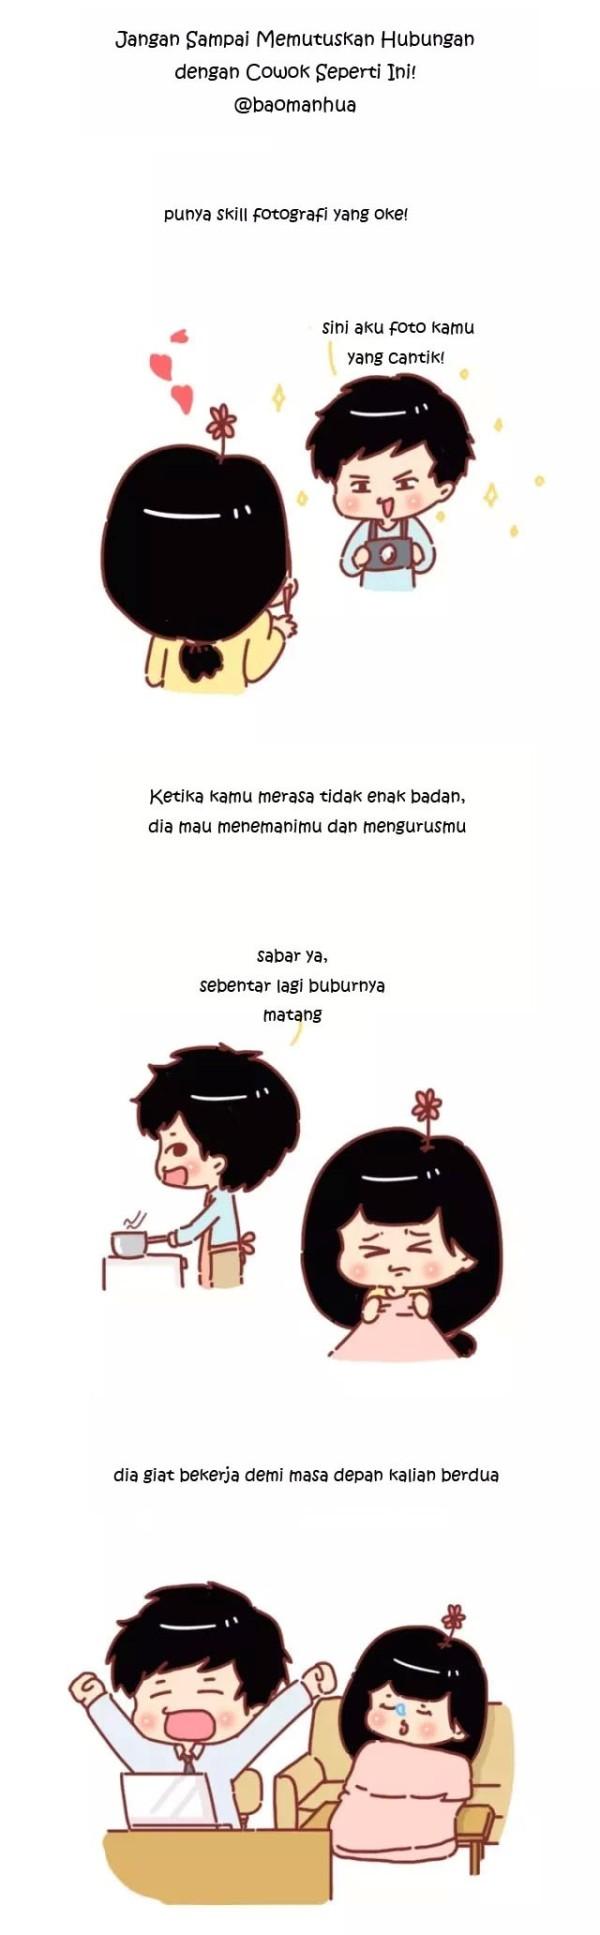 555 HAWA-Jangan Sampai Memutuskan Hubungan dengan Cowok Seperti Ini!-1